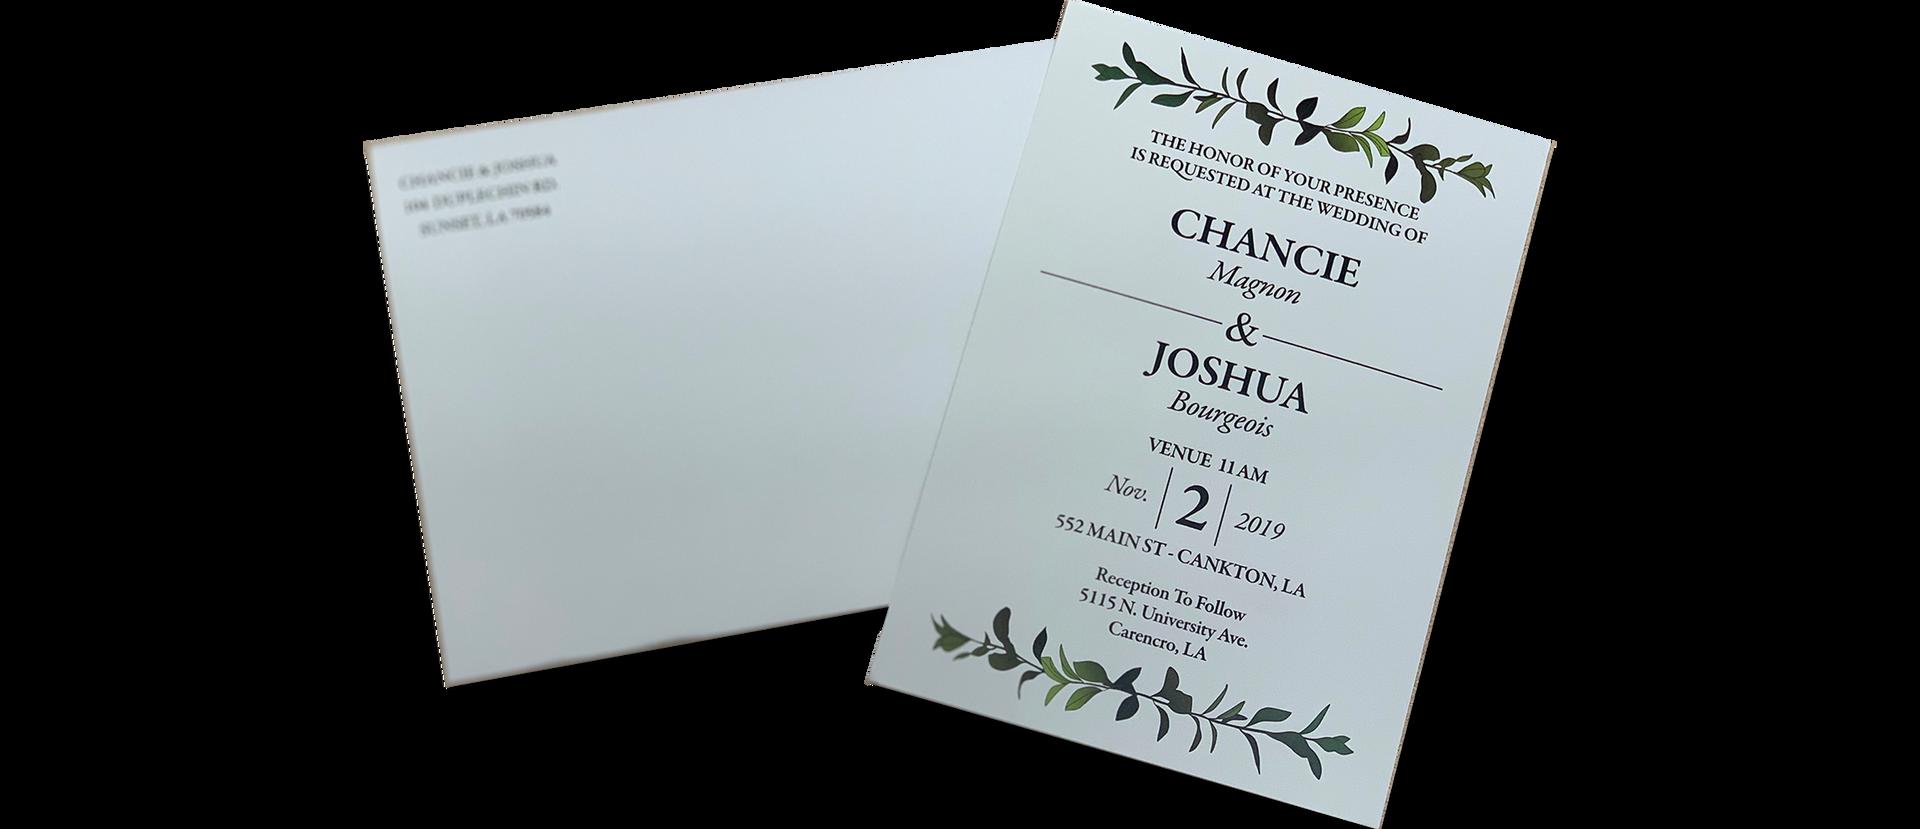 Chancie Magnon - Invitations 1.png